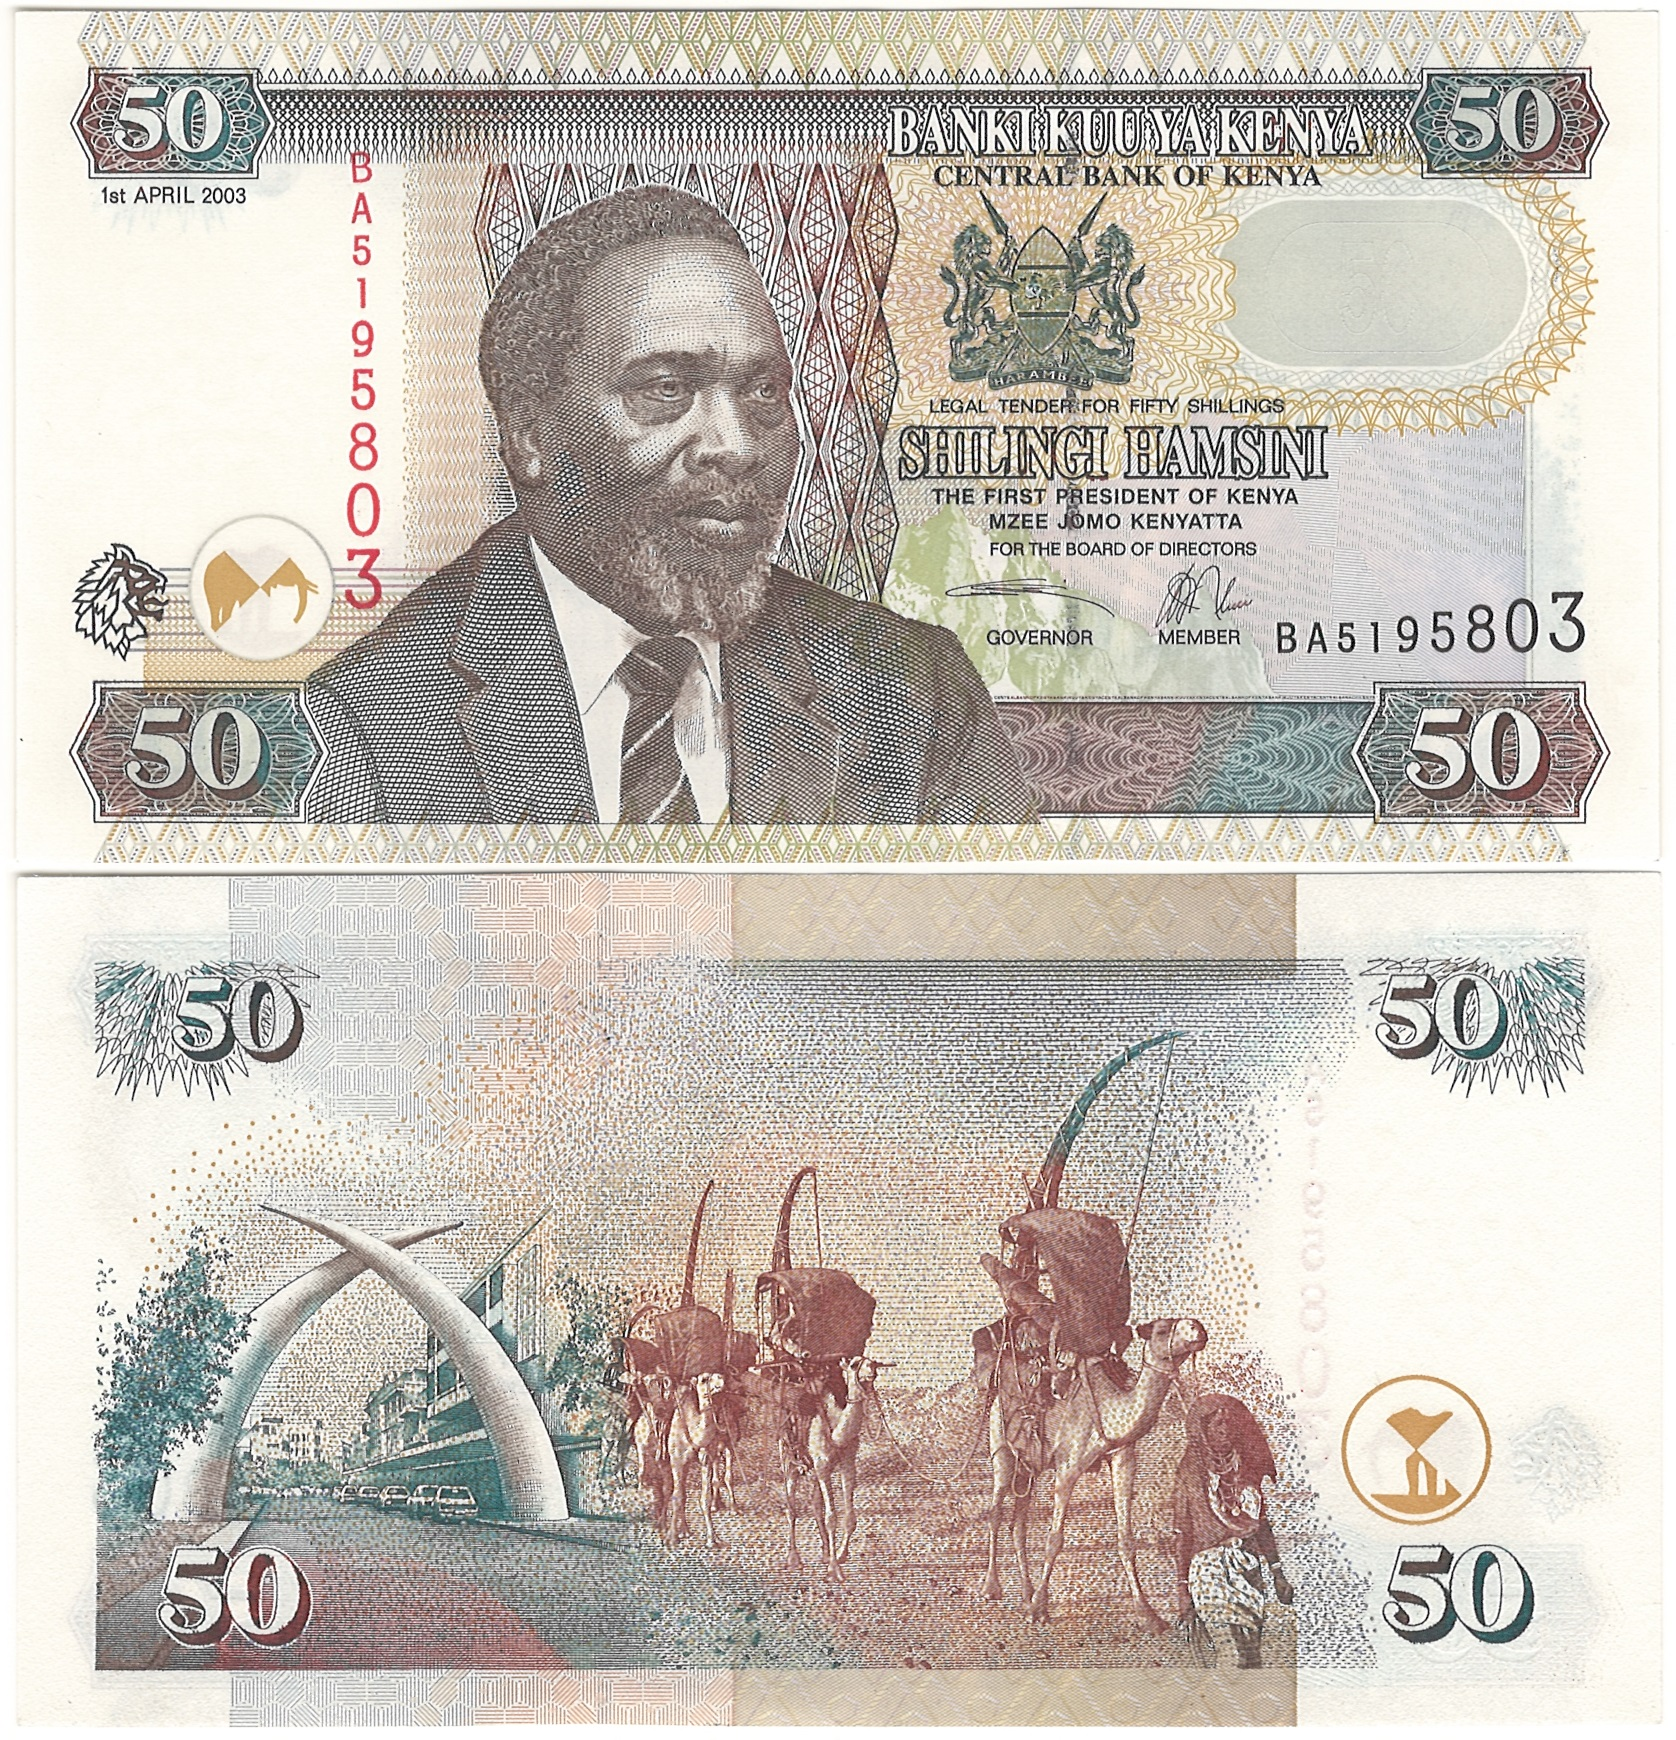 KENYA 50 SHILLINGS 2003 P 41 UNC